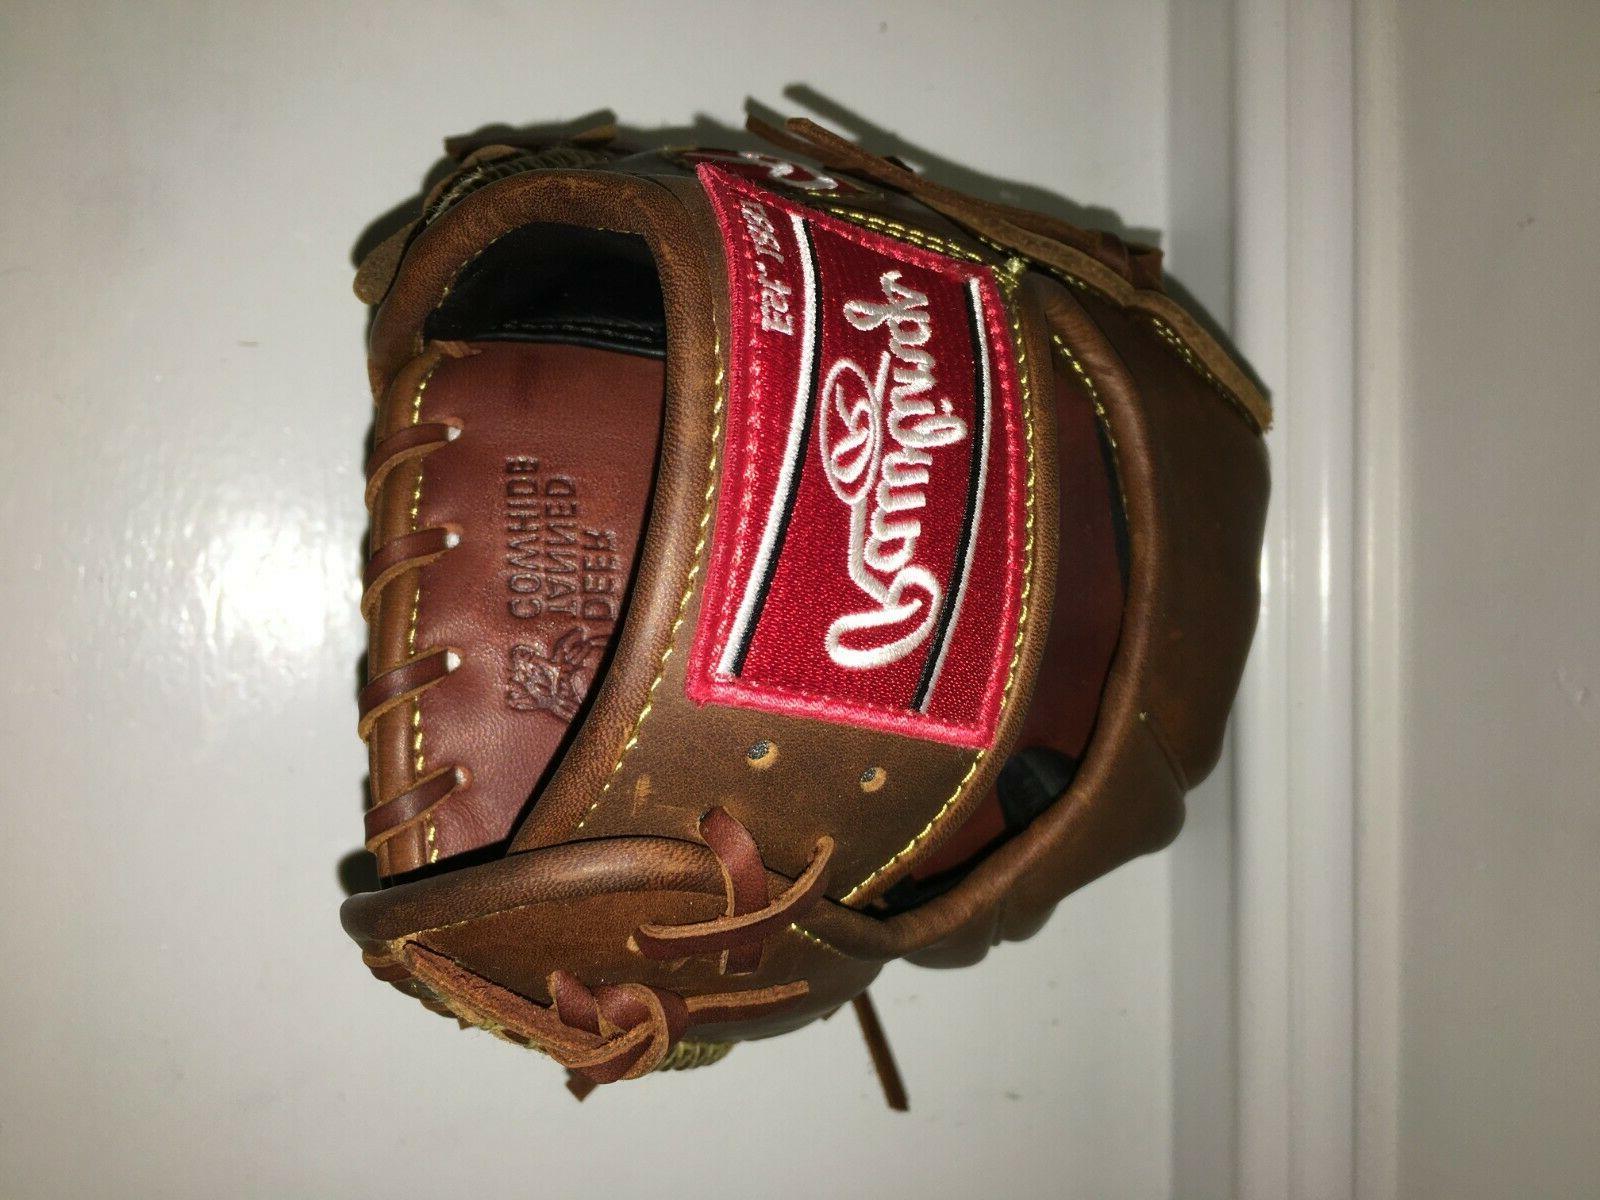 NEW Rawlings PRO205-9TIFS Heart the Baseball Glove FING SHIFT